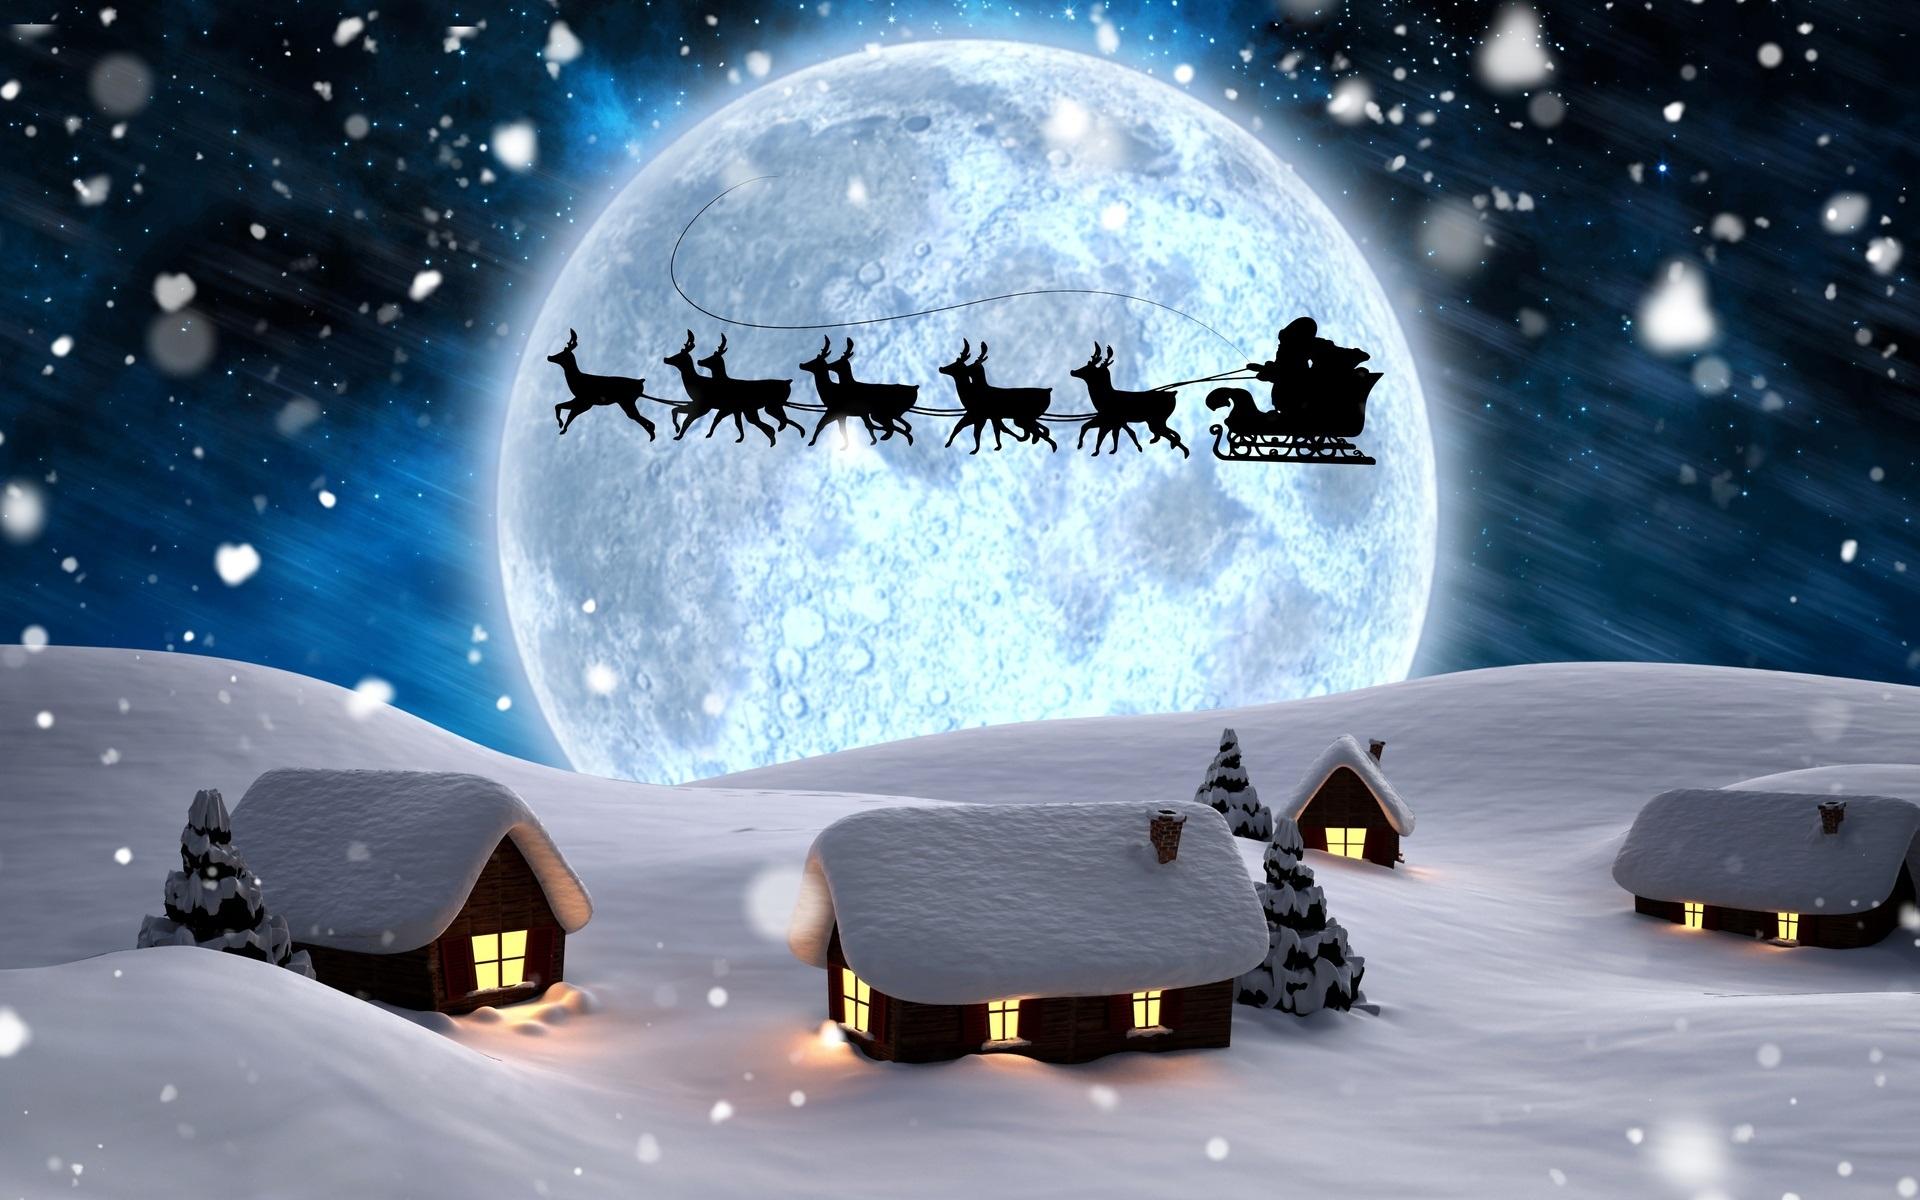 Картинка на телефон заставка крутая зима